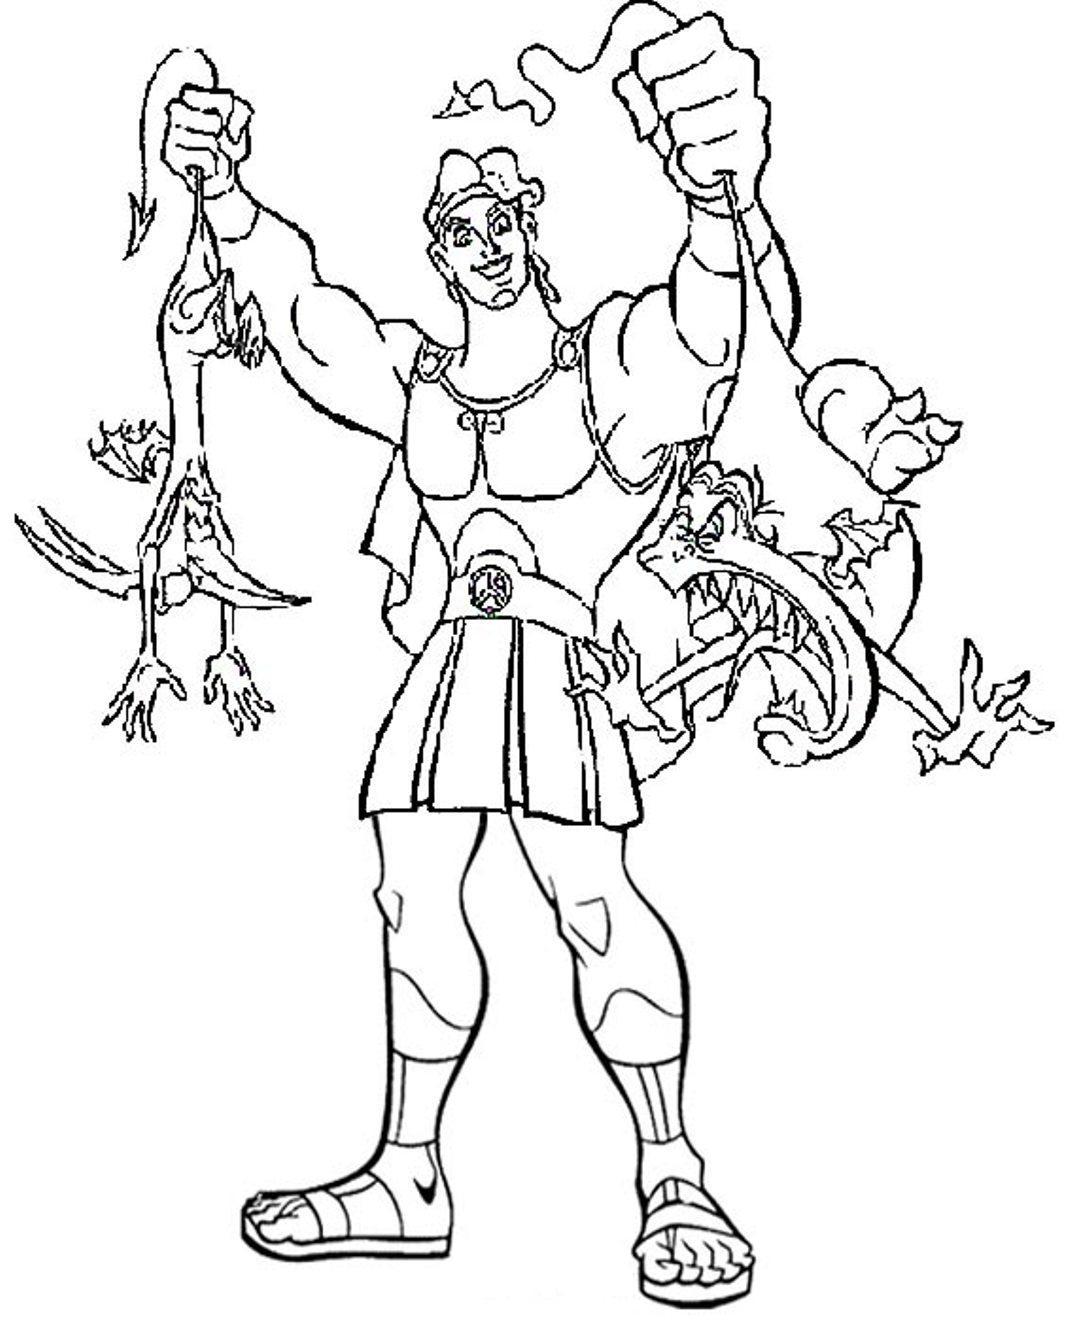 Heracles coloring #18, Download drawings